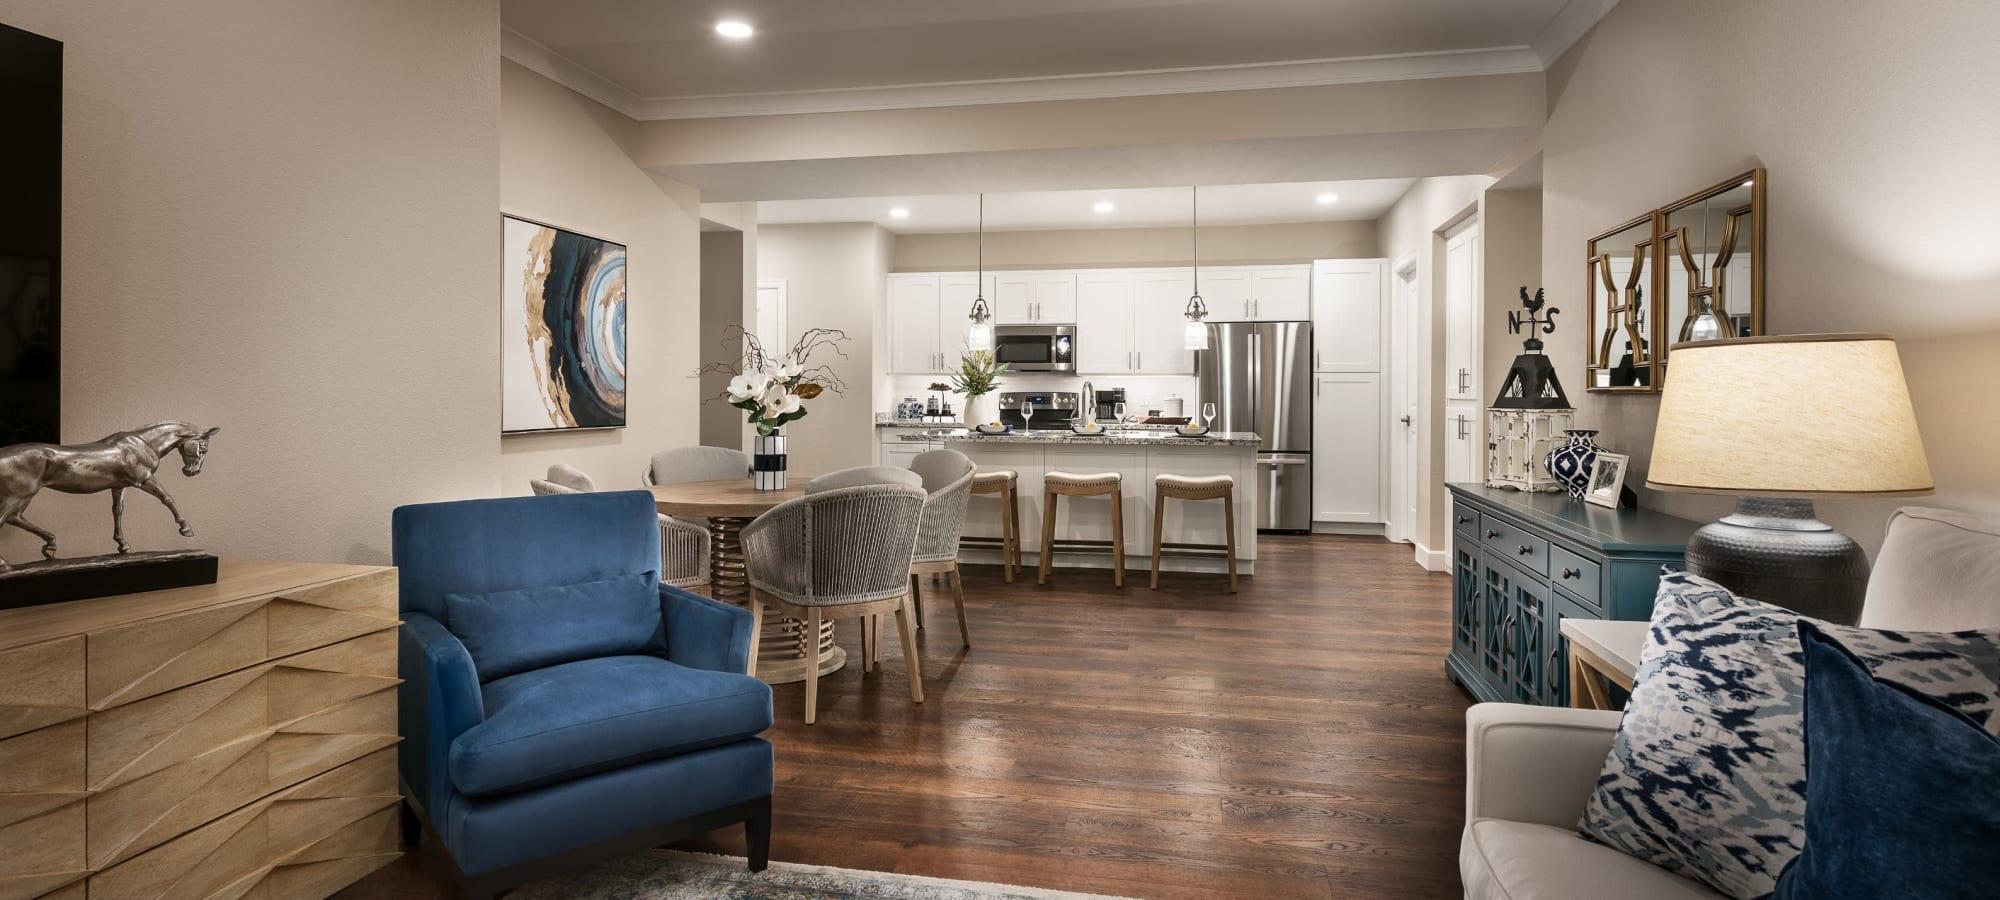 Open living room at San Artes in Scottsdale, Arizona